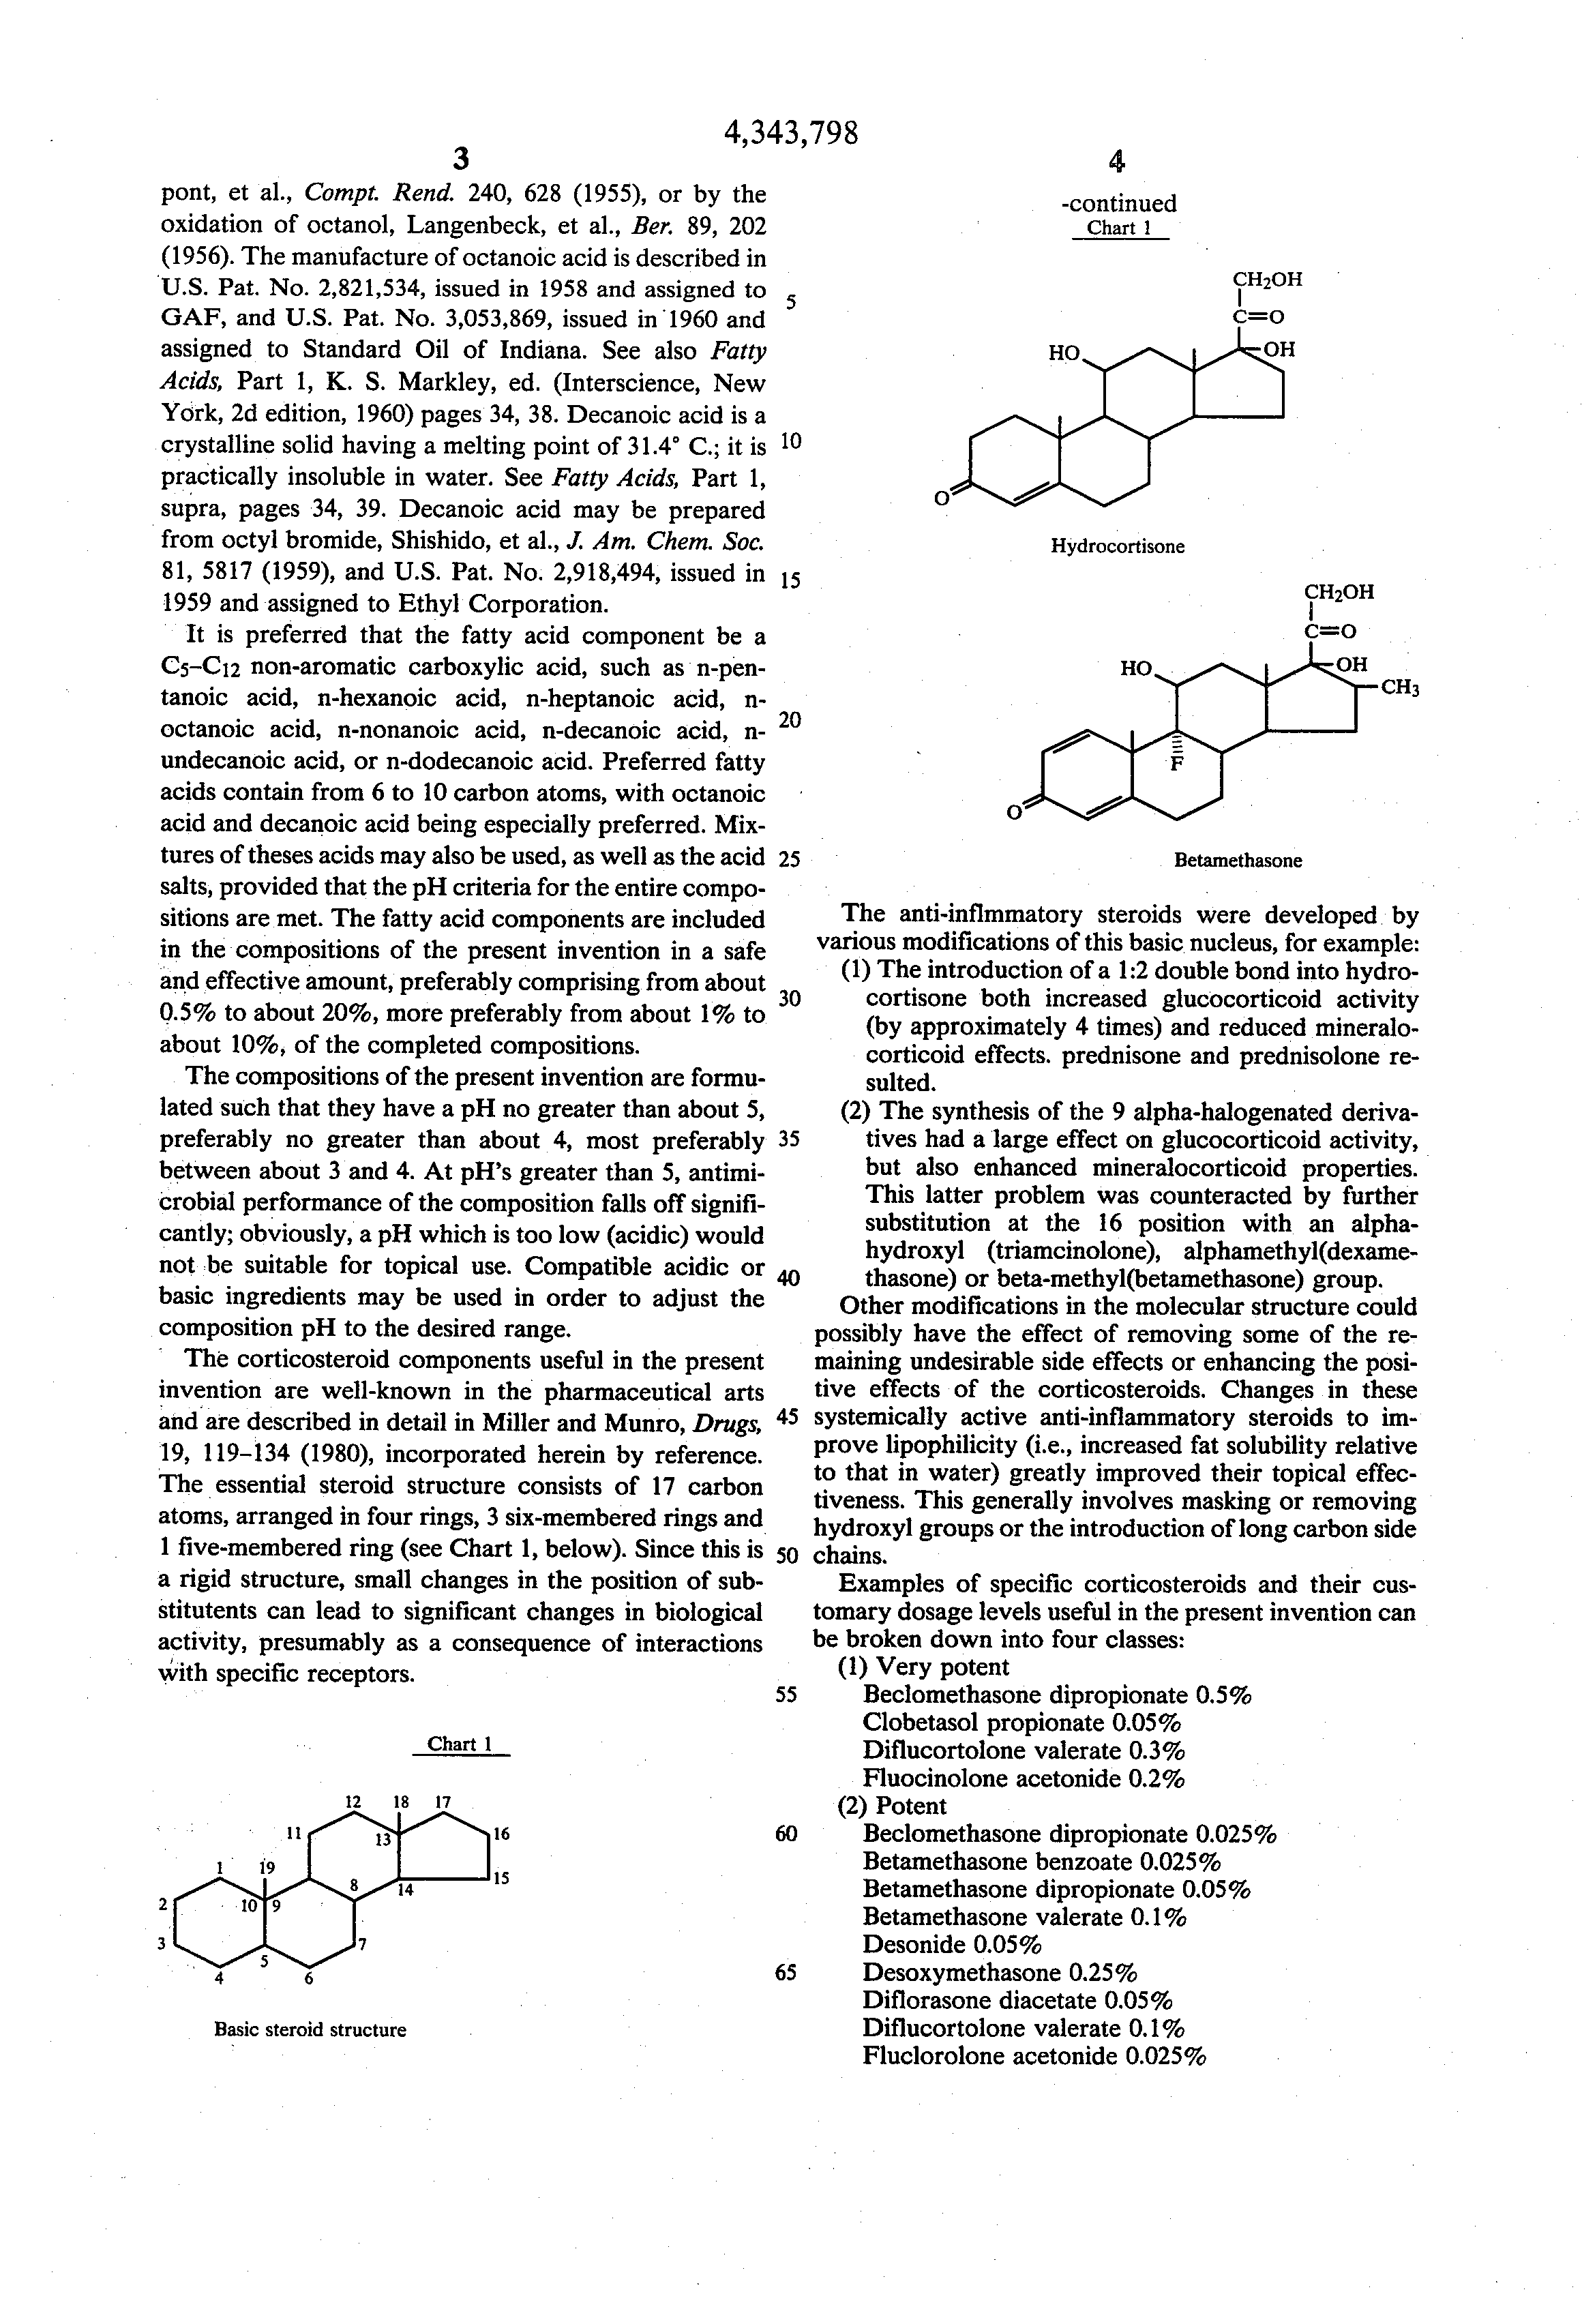 diflorasone diacetate steroid class